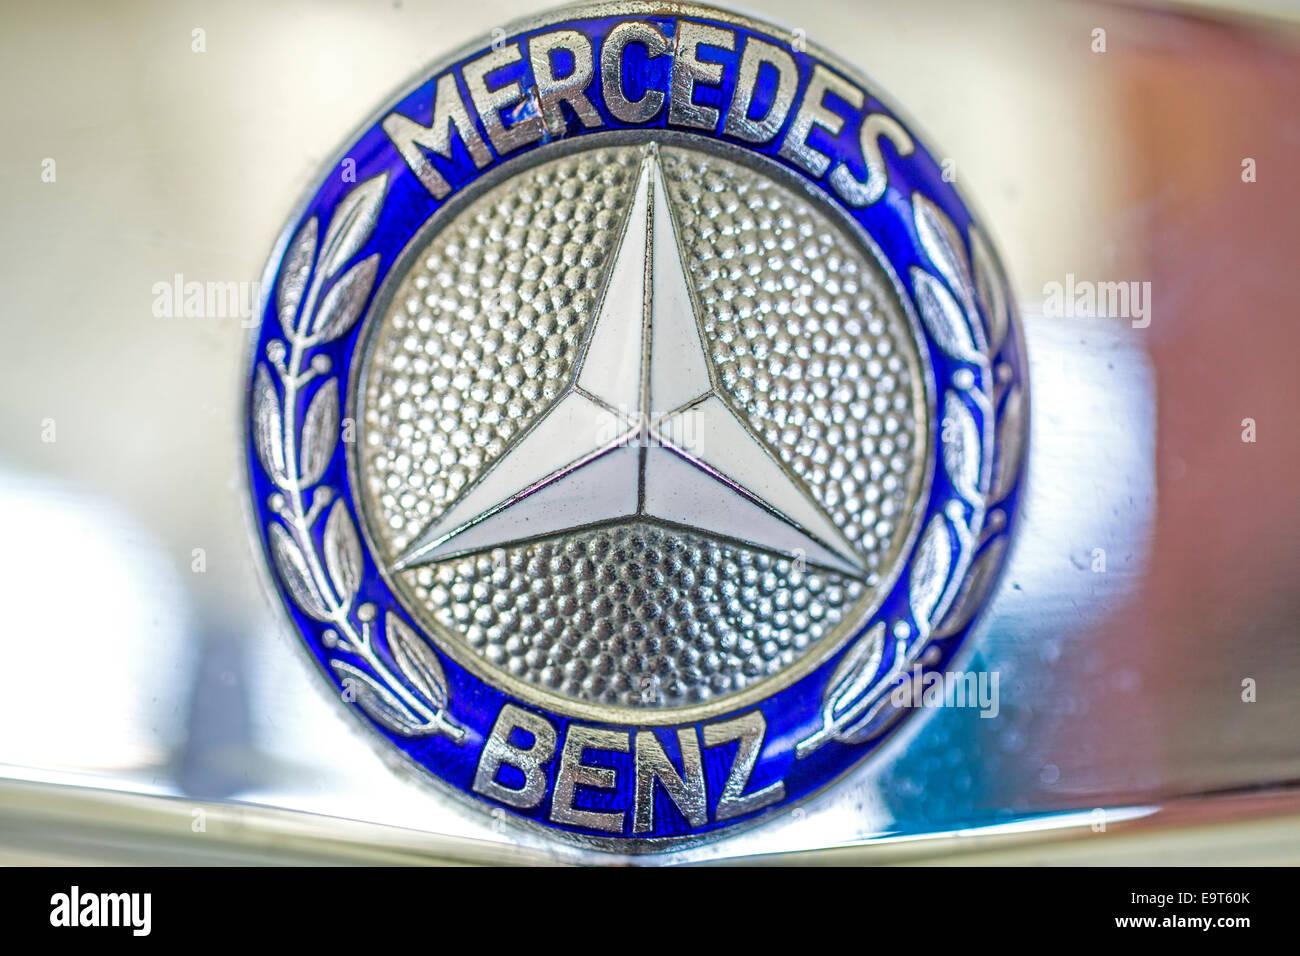 Mercedes Benz - Stock Image